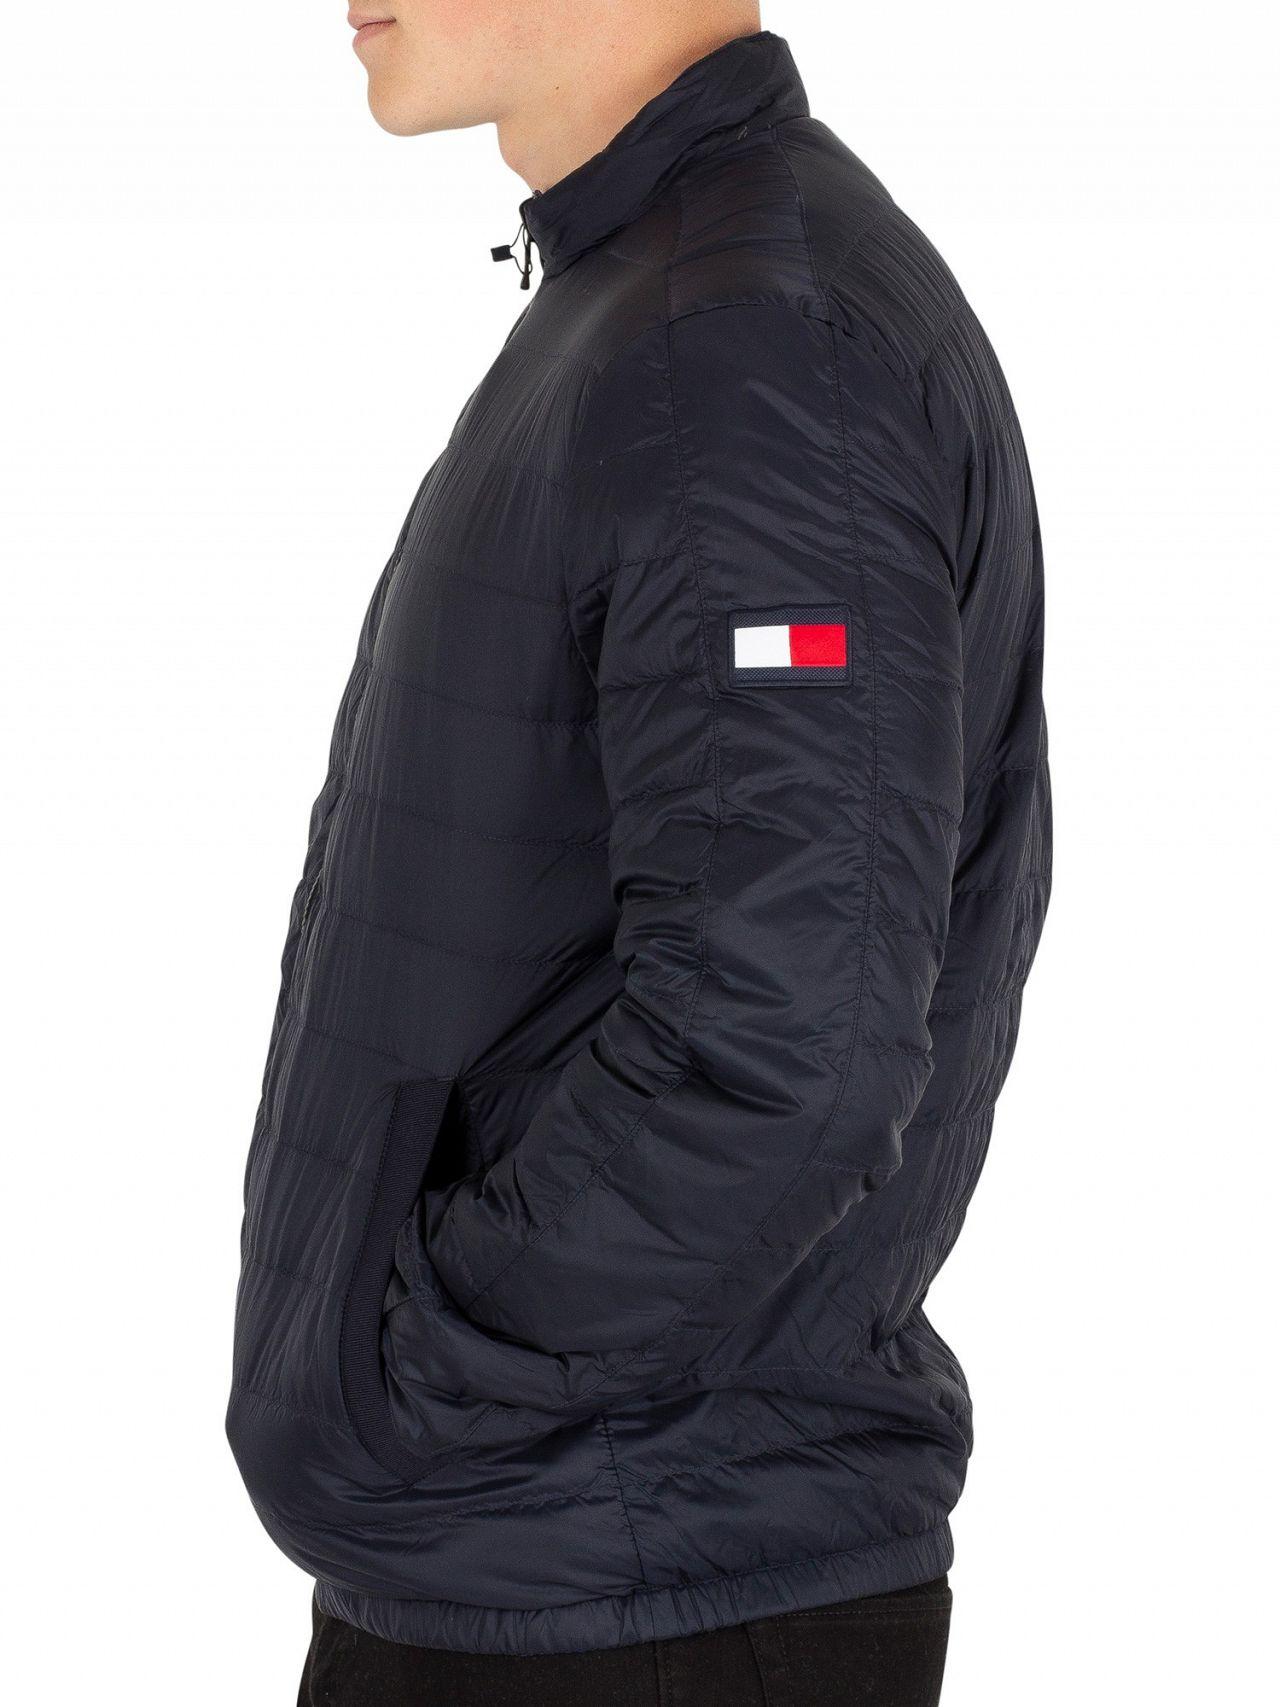 66414c0ac74 Tommy Hilfiger Sky Captain Reversible Nylon Down Jacket